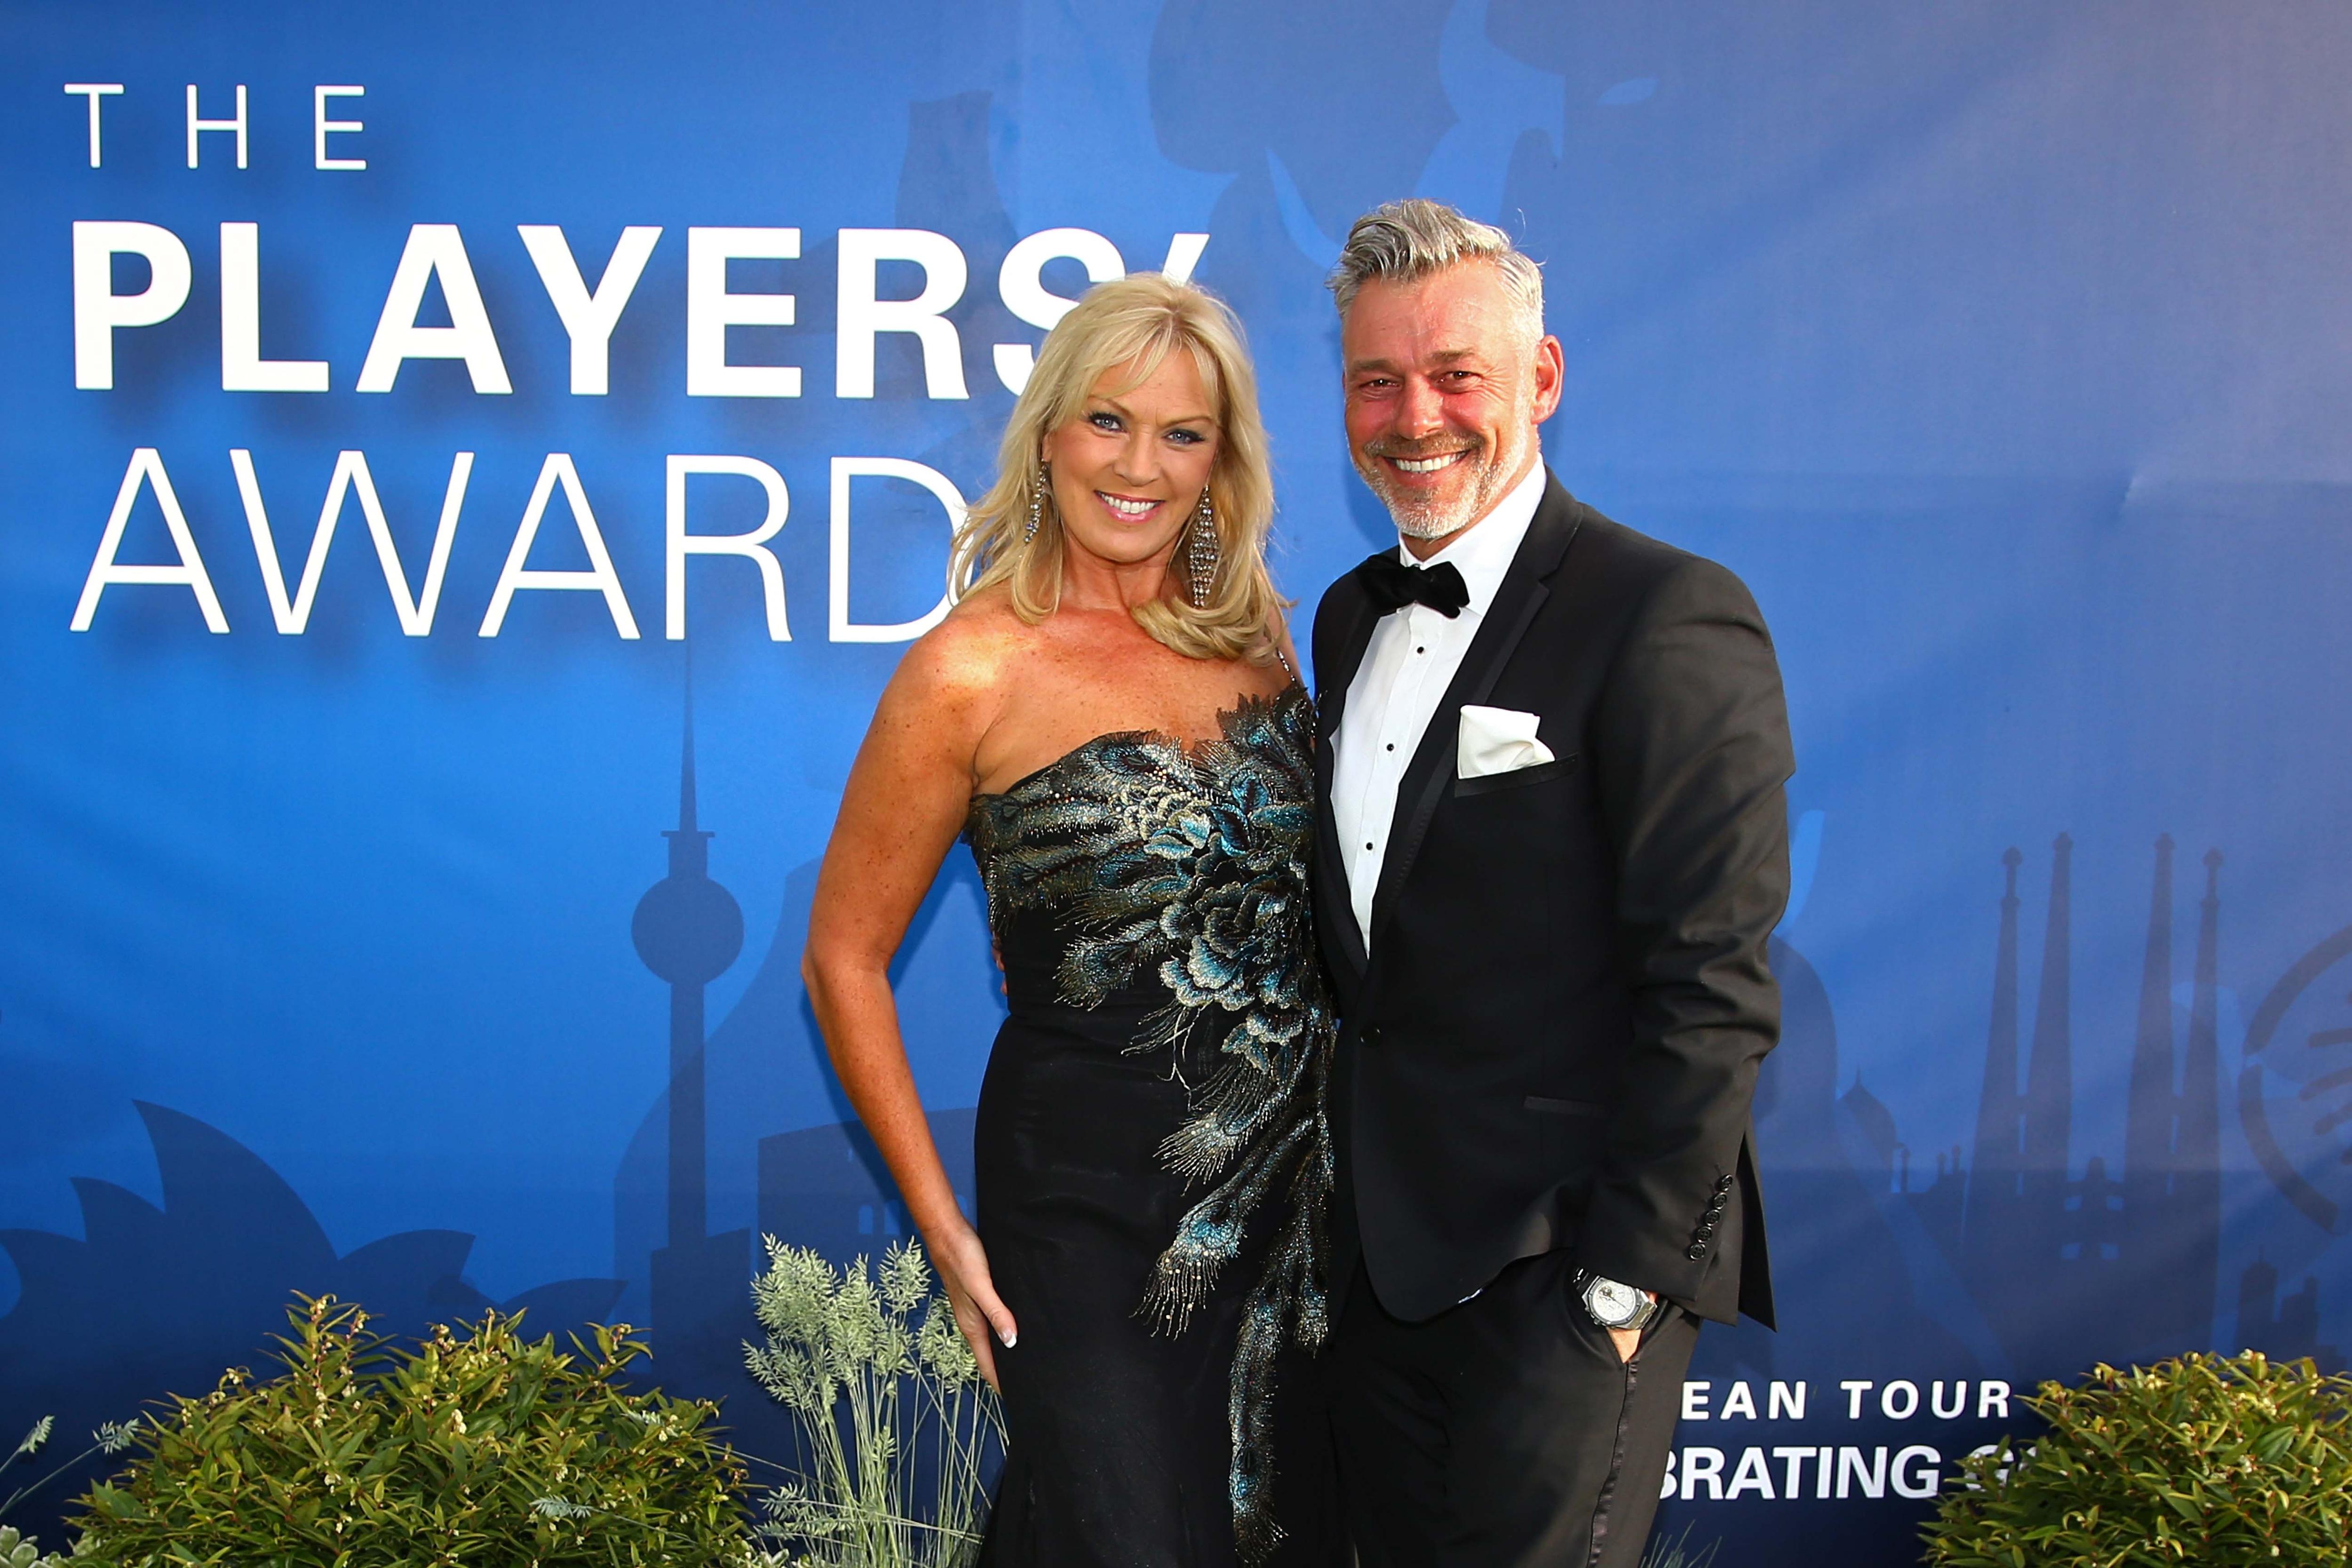 Darren Clarke and his wife Alison